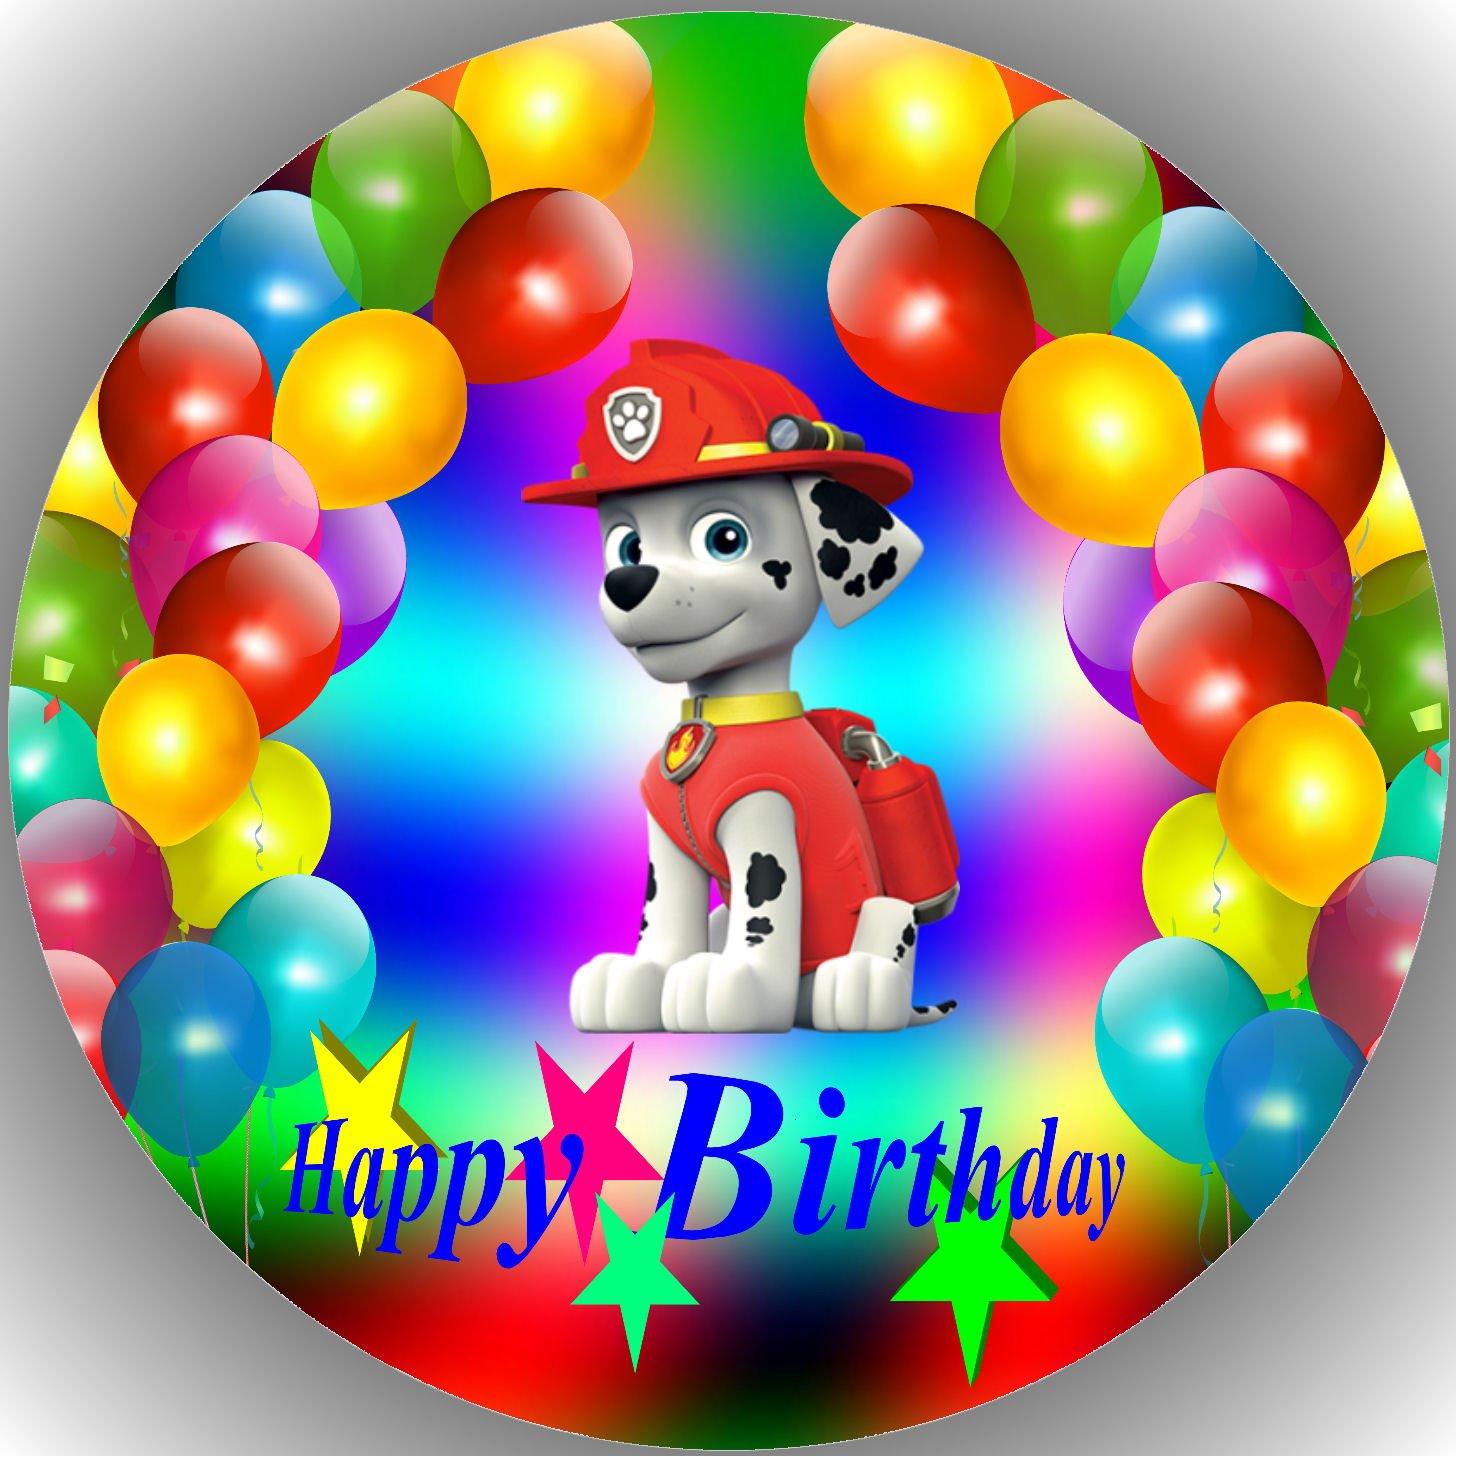 Tortenaufleger Geburtstag Party Tortenbild Fondant Oblate Transformers  P2